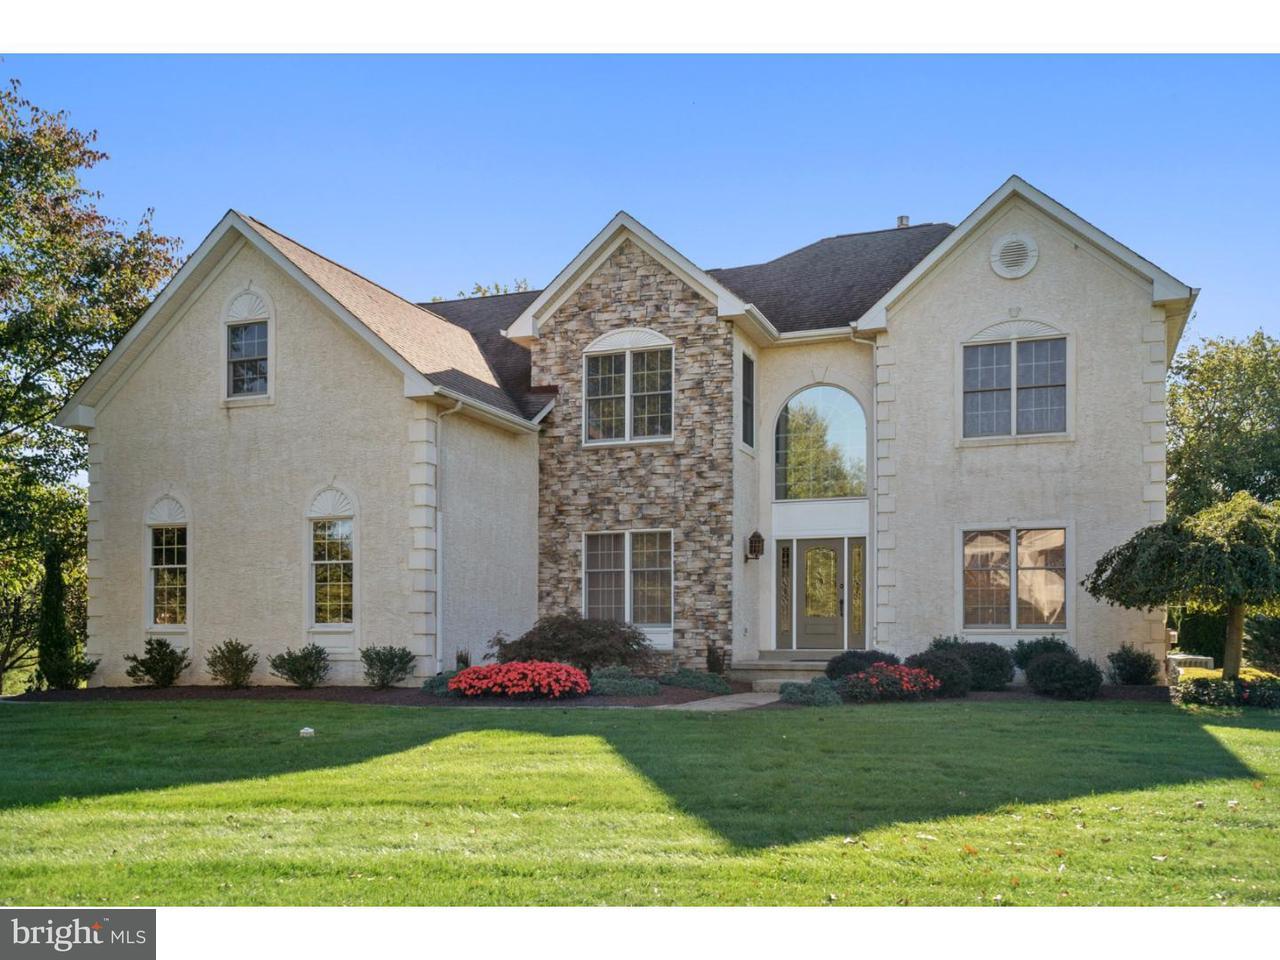 Single Family Home for Rent at 75 ADDIS Drive Southampton, Pennsylvania 18966 United States